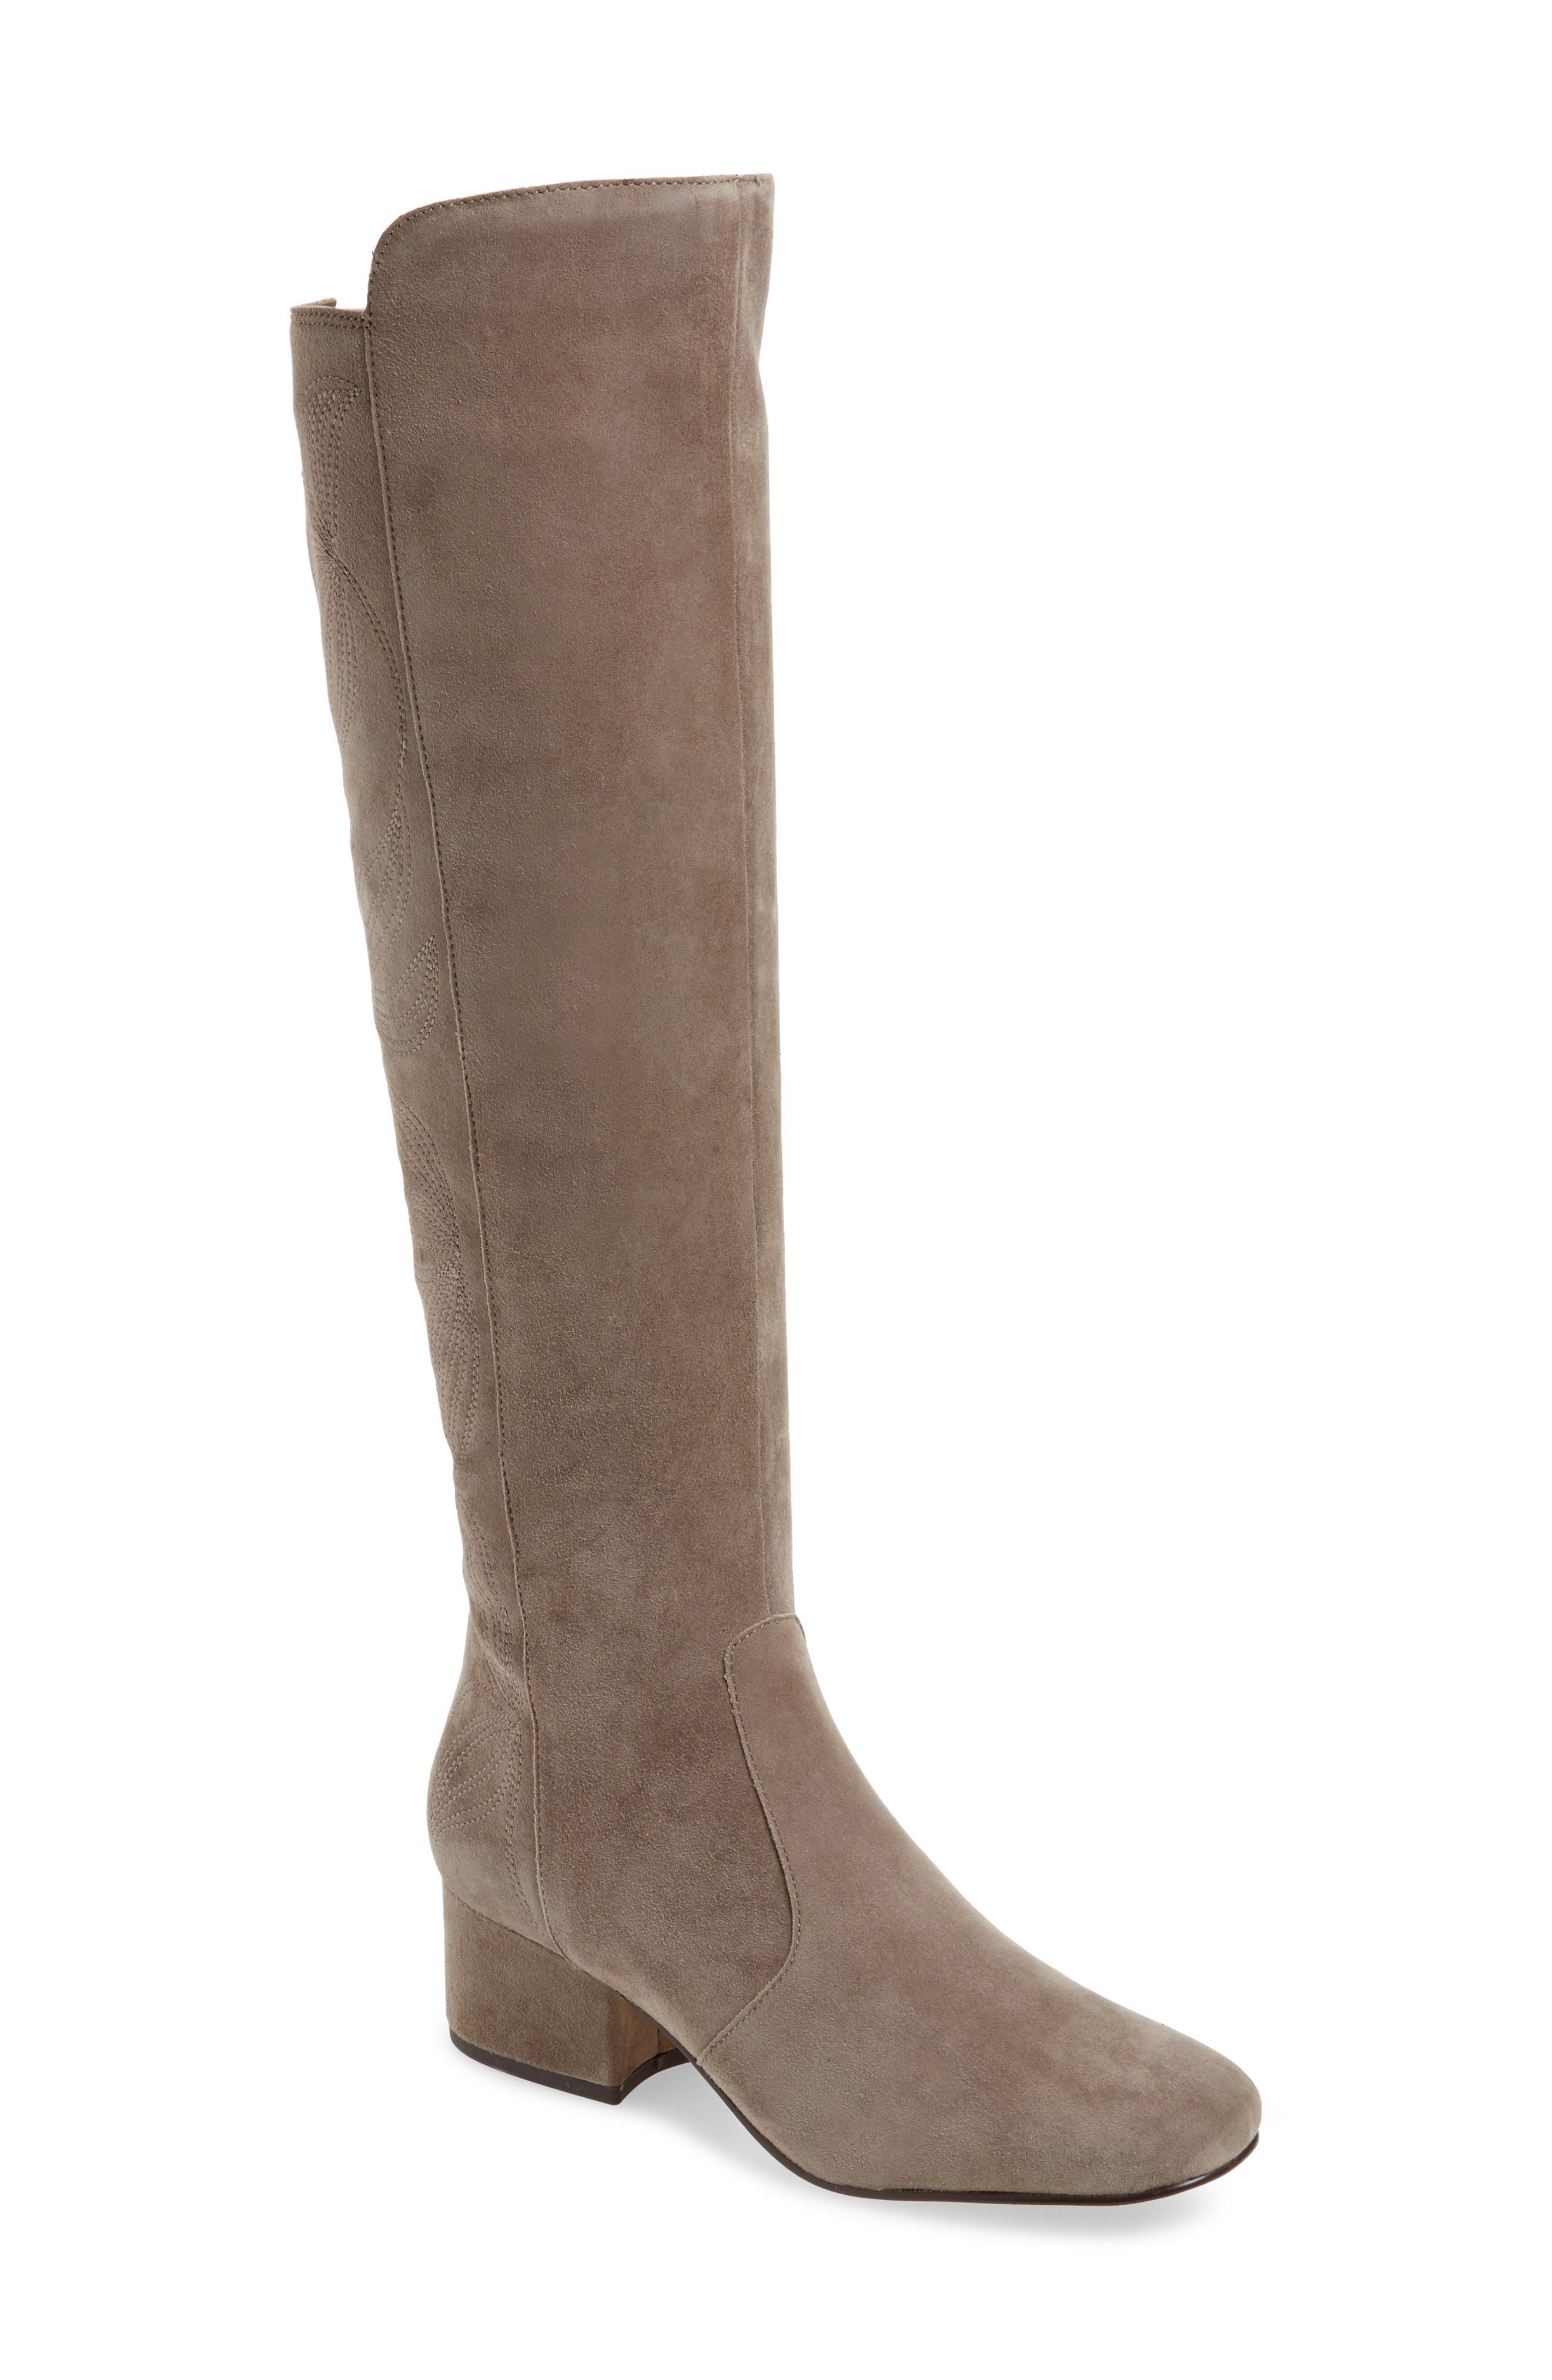 Alternate Image 1 Selected - Marc Fisher LTD Tawnna Knee High Boot (Women)